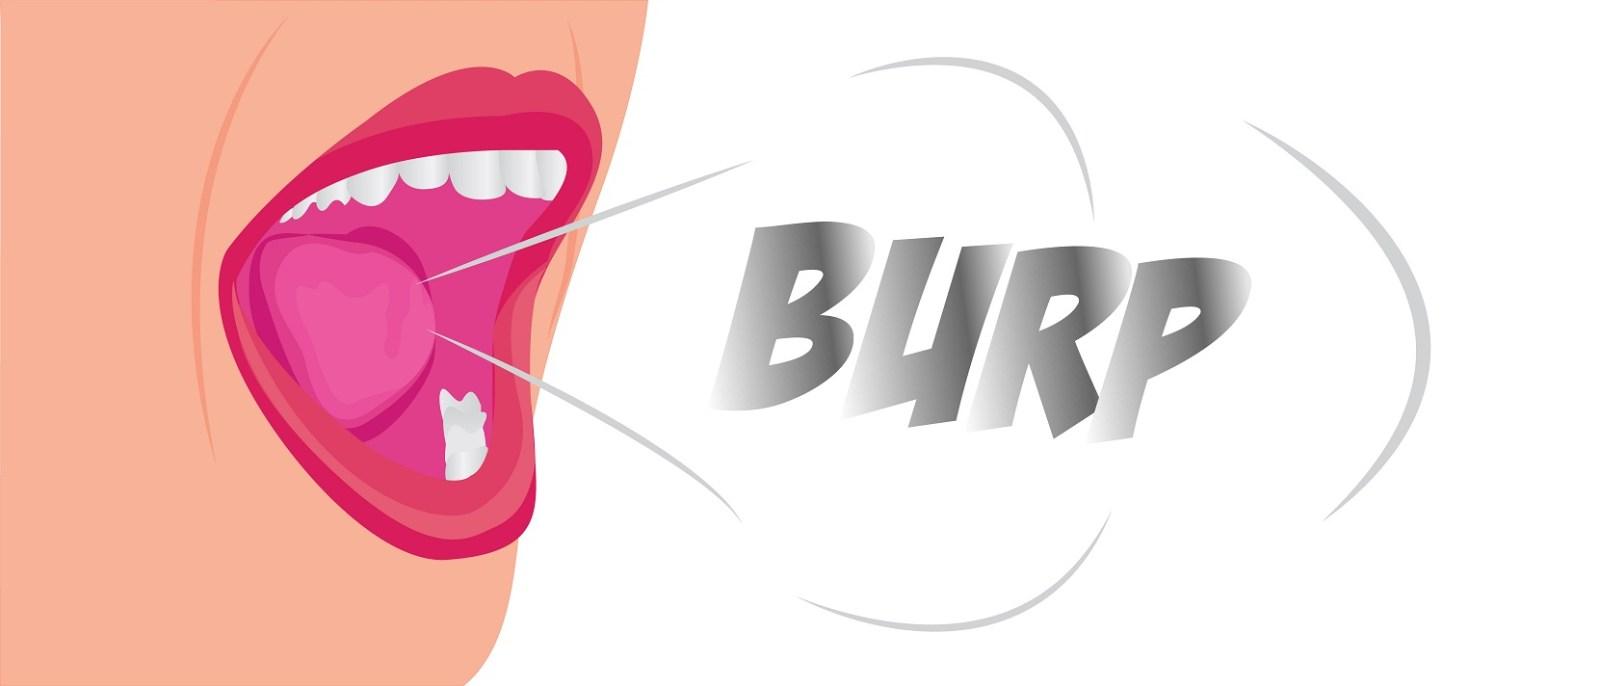 sulphur burp